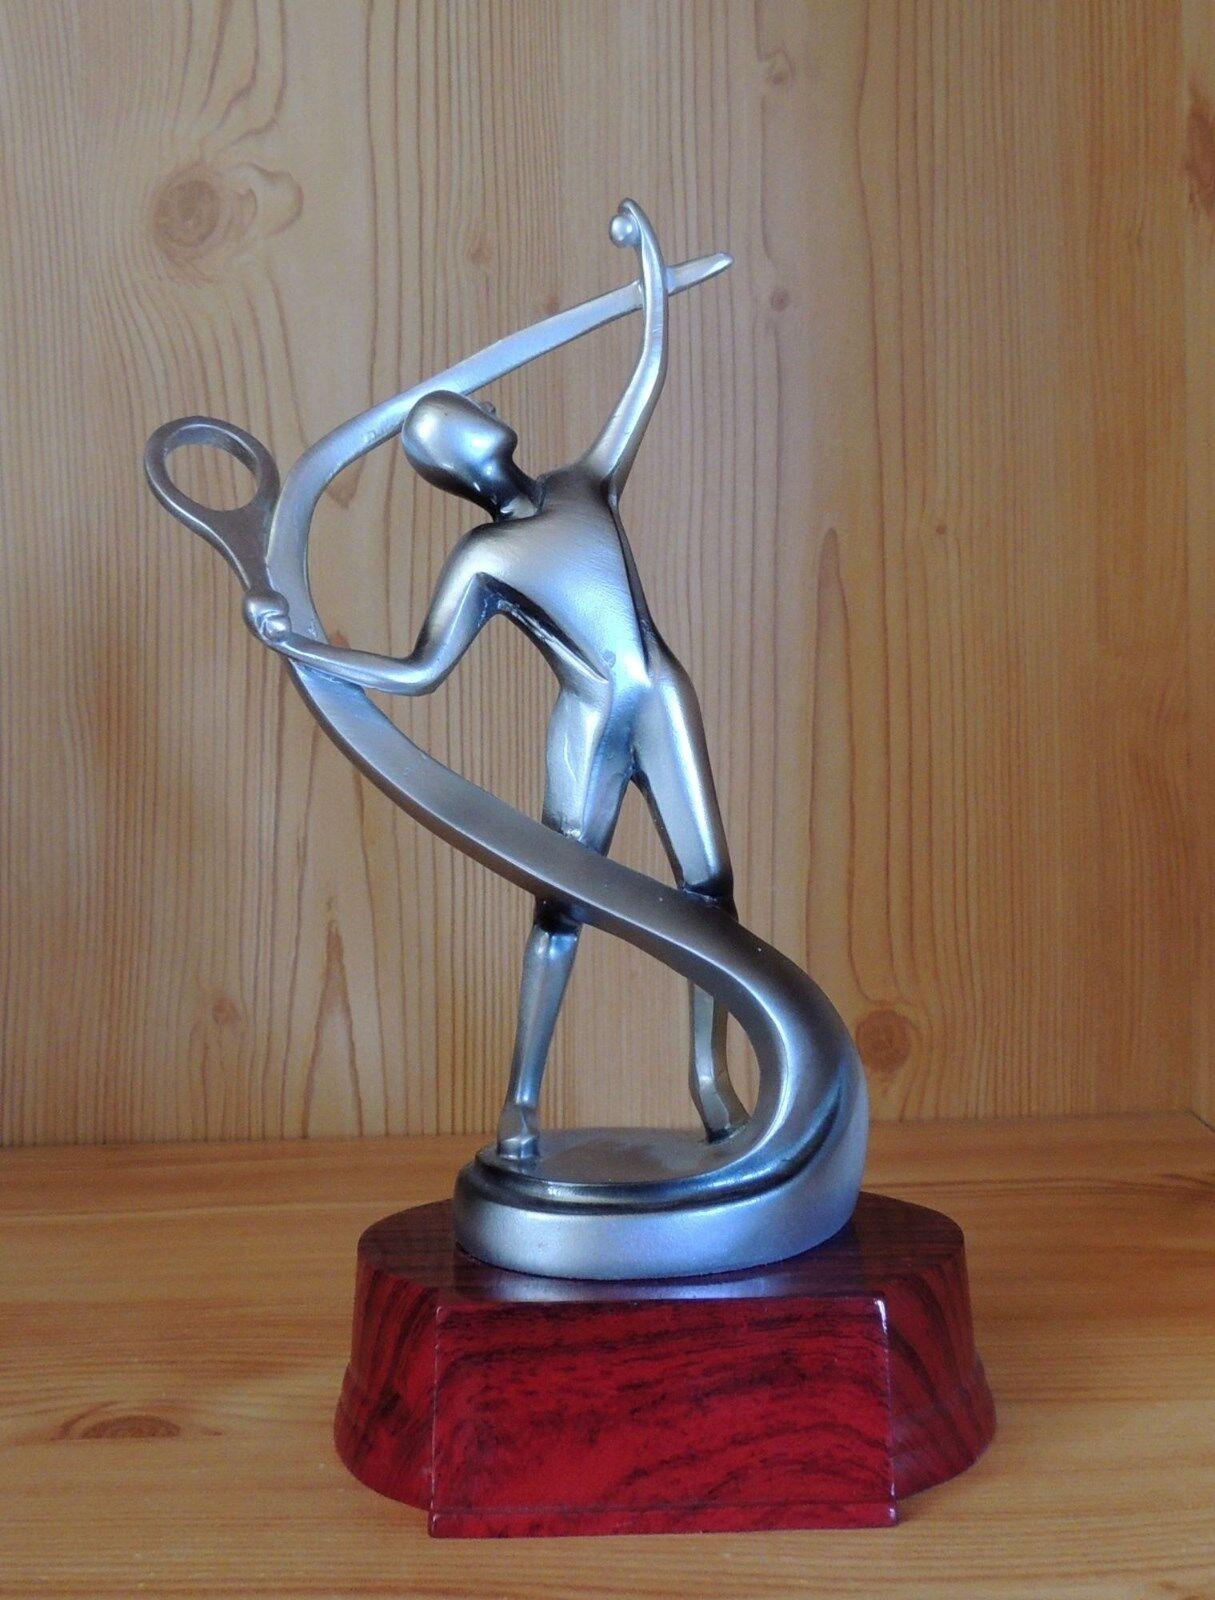 1 Pokal Design Figur Tennis Tennis Tennis 23cm (Doppel Sieger Wanderpokal Turnier Medaillen) 661b94